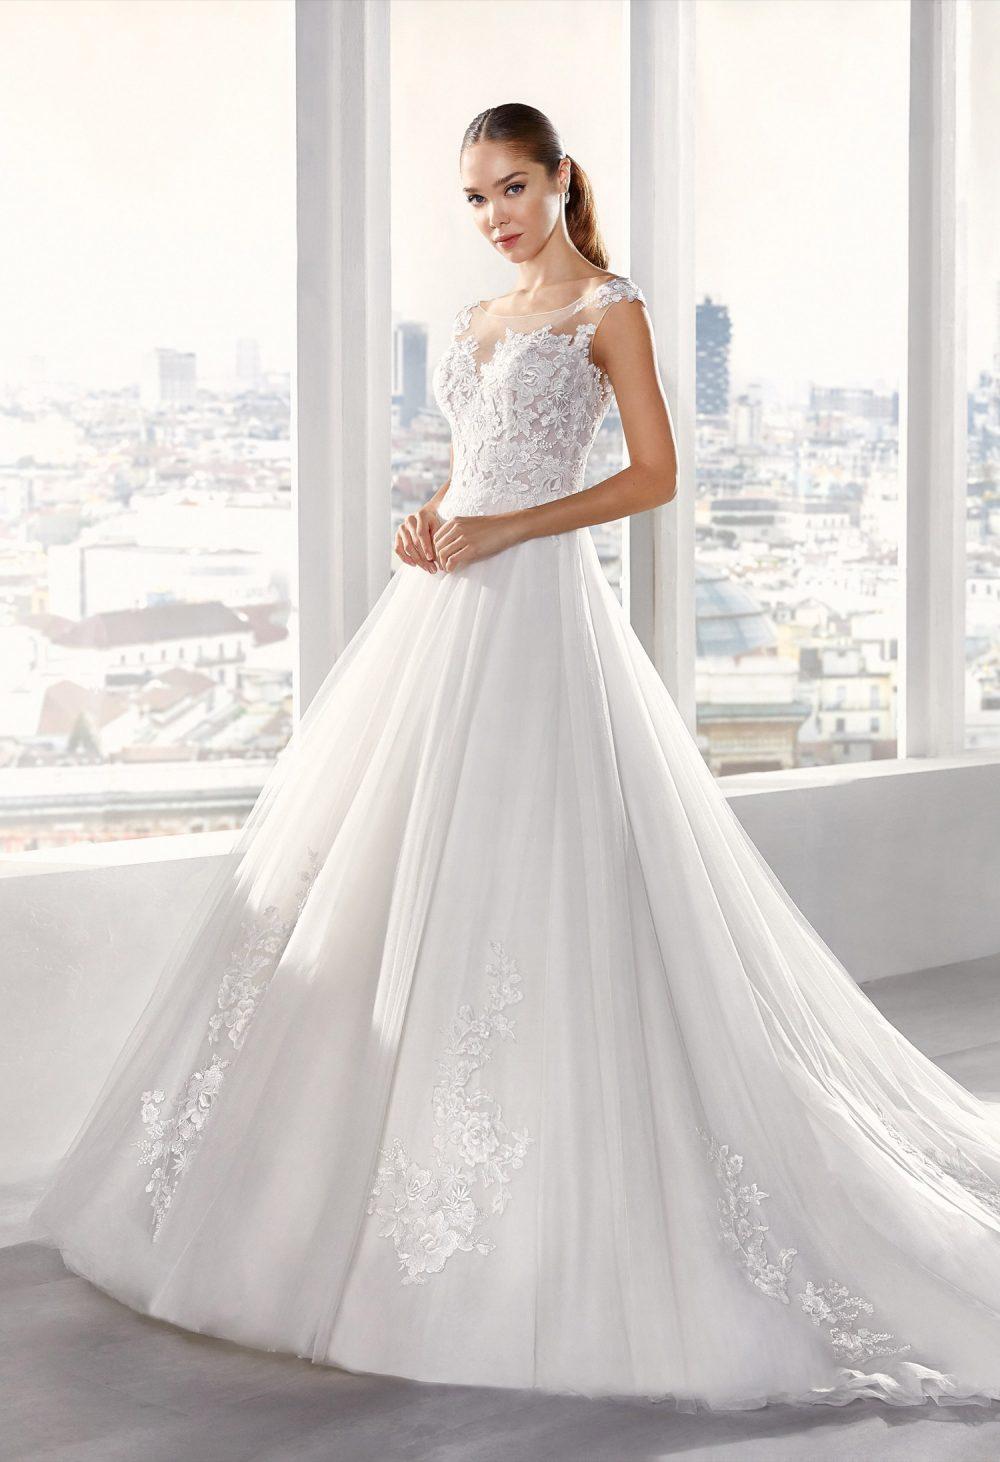 Mariages: abito da sposa Jolies 2021 a Vicenza, Verona, Padova, Veneto JO12125